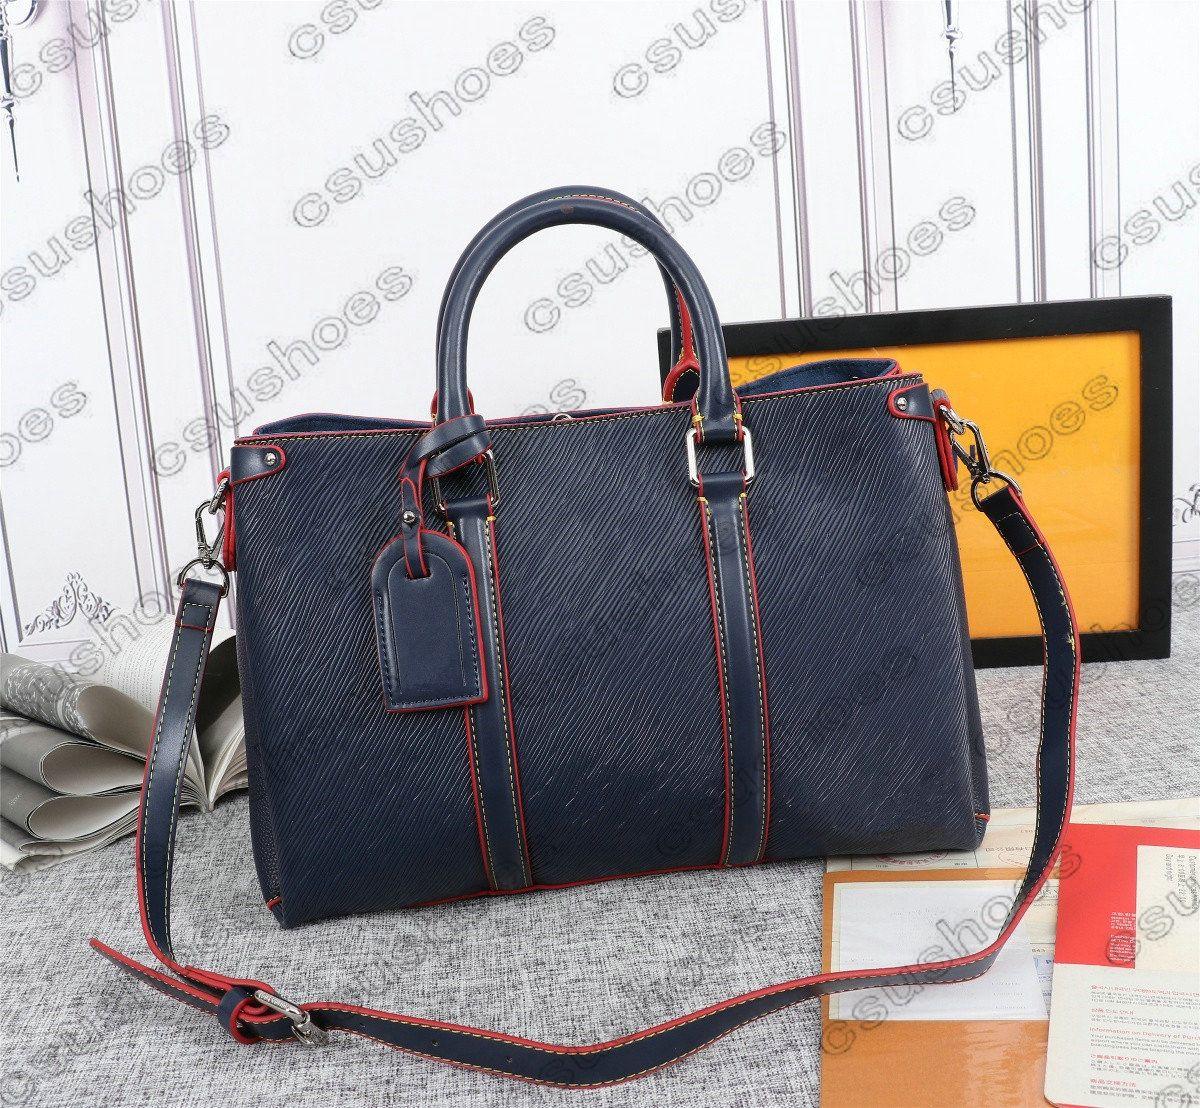 Borsa spalla lussurys womens open m44815 RJBBD Messenger Bags BB Canvas Business Canvas-Brown Borsa Brown Designer Designer TOTE M44816 MANO CSFF